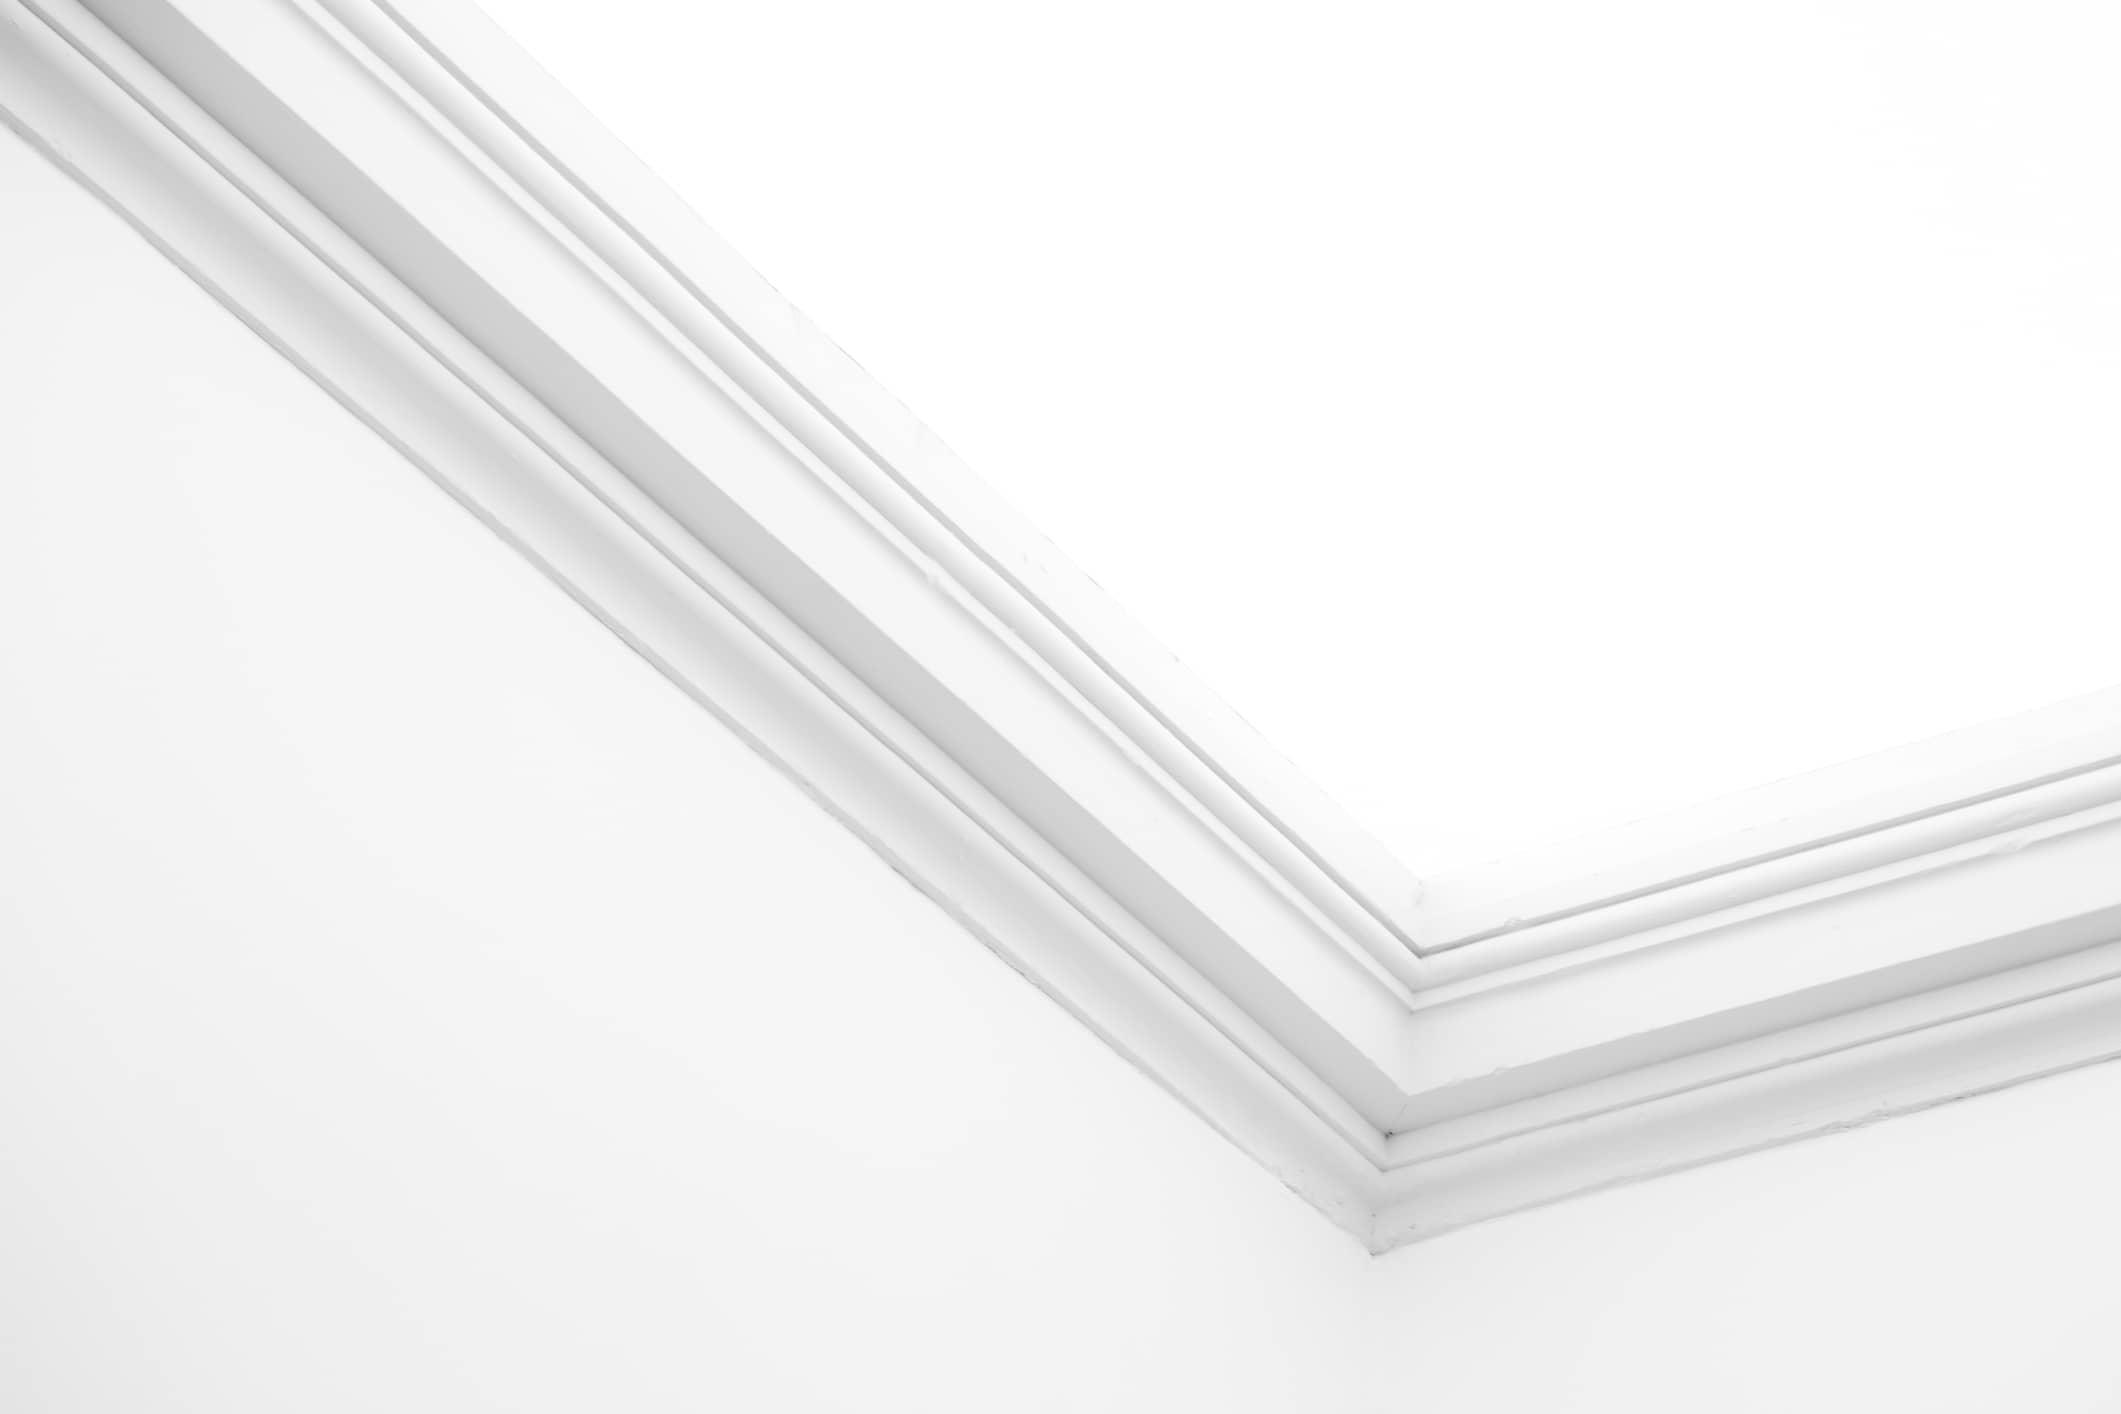 Ornamental-moulding-504007422_2125x1416